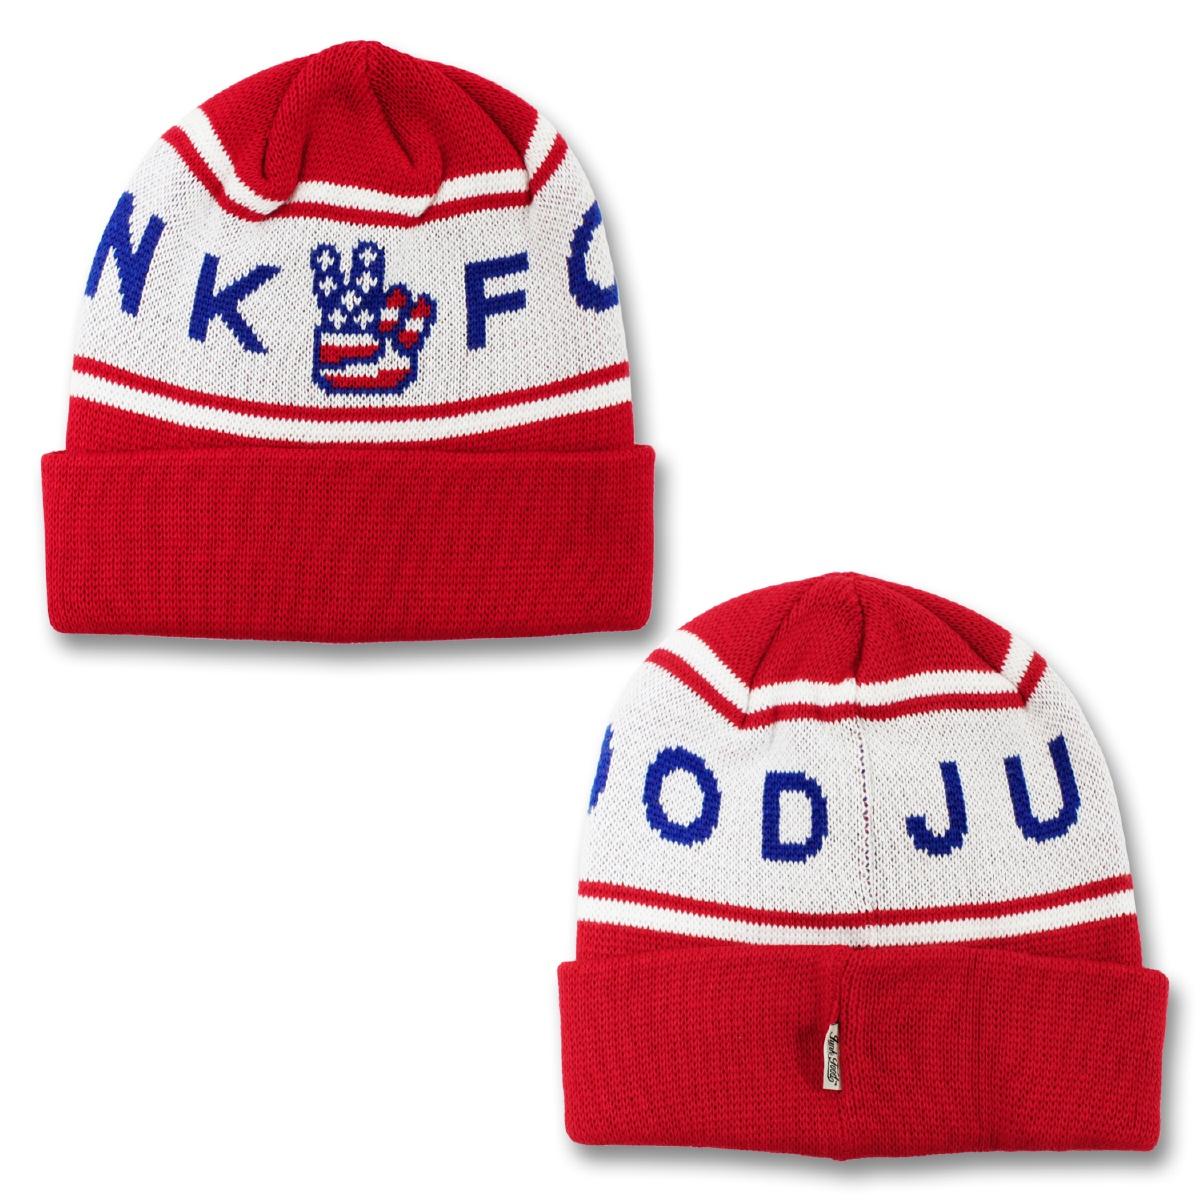 JUNK FOOD ジャンクフード JACQUARD KNIT CAP